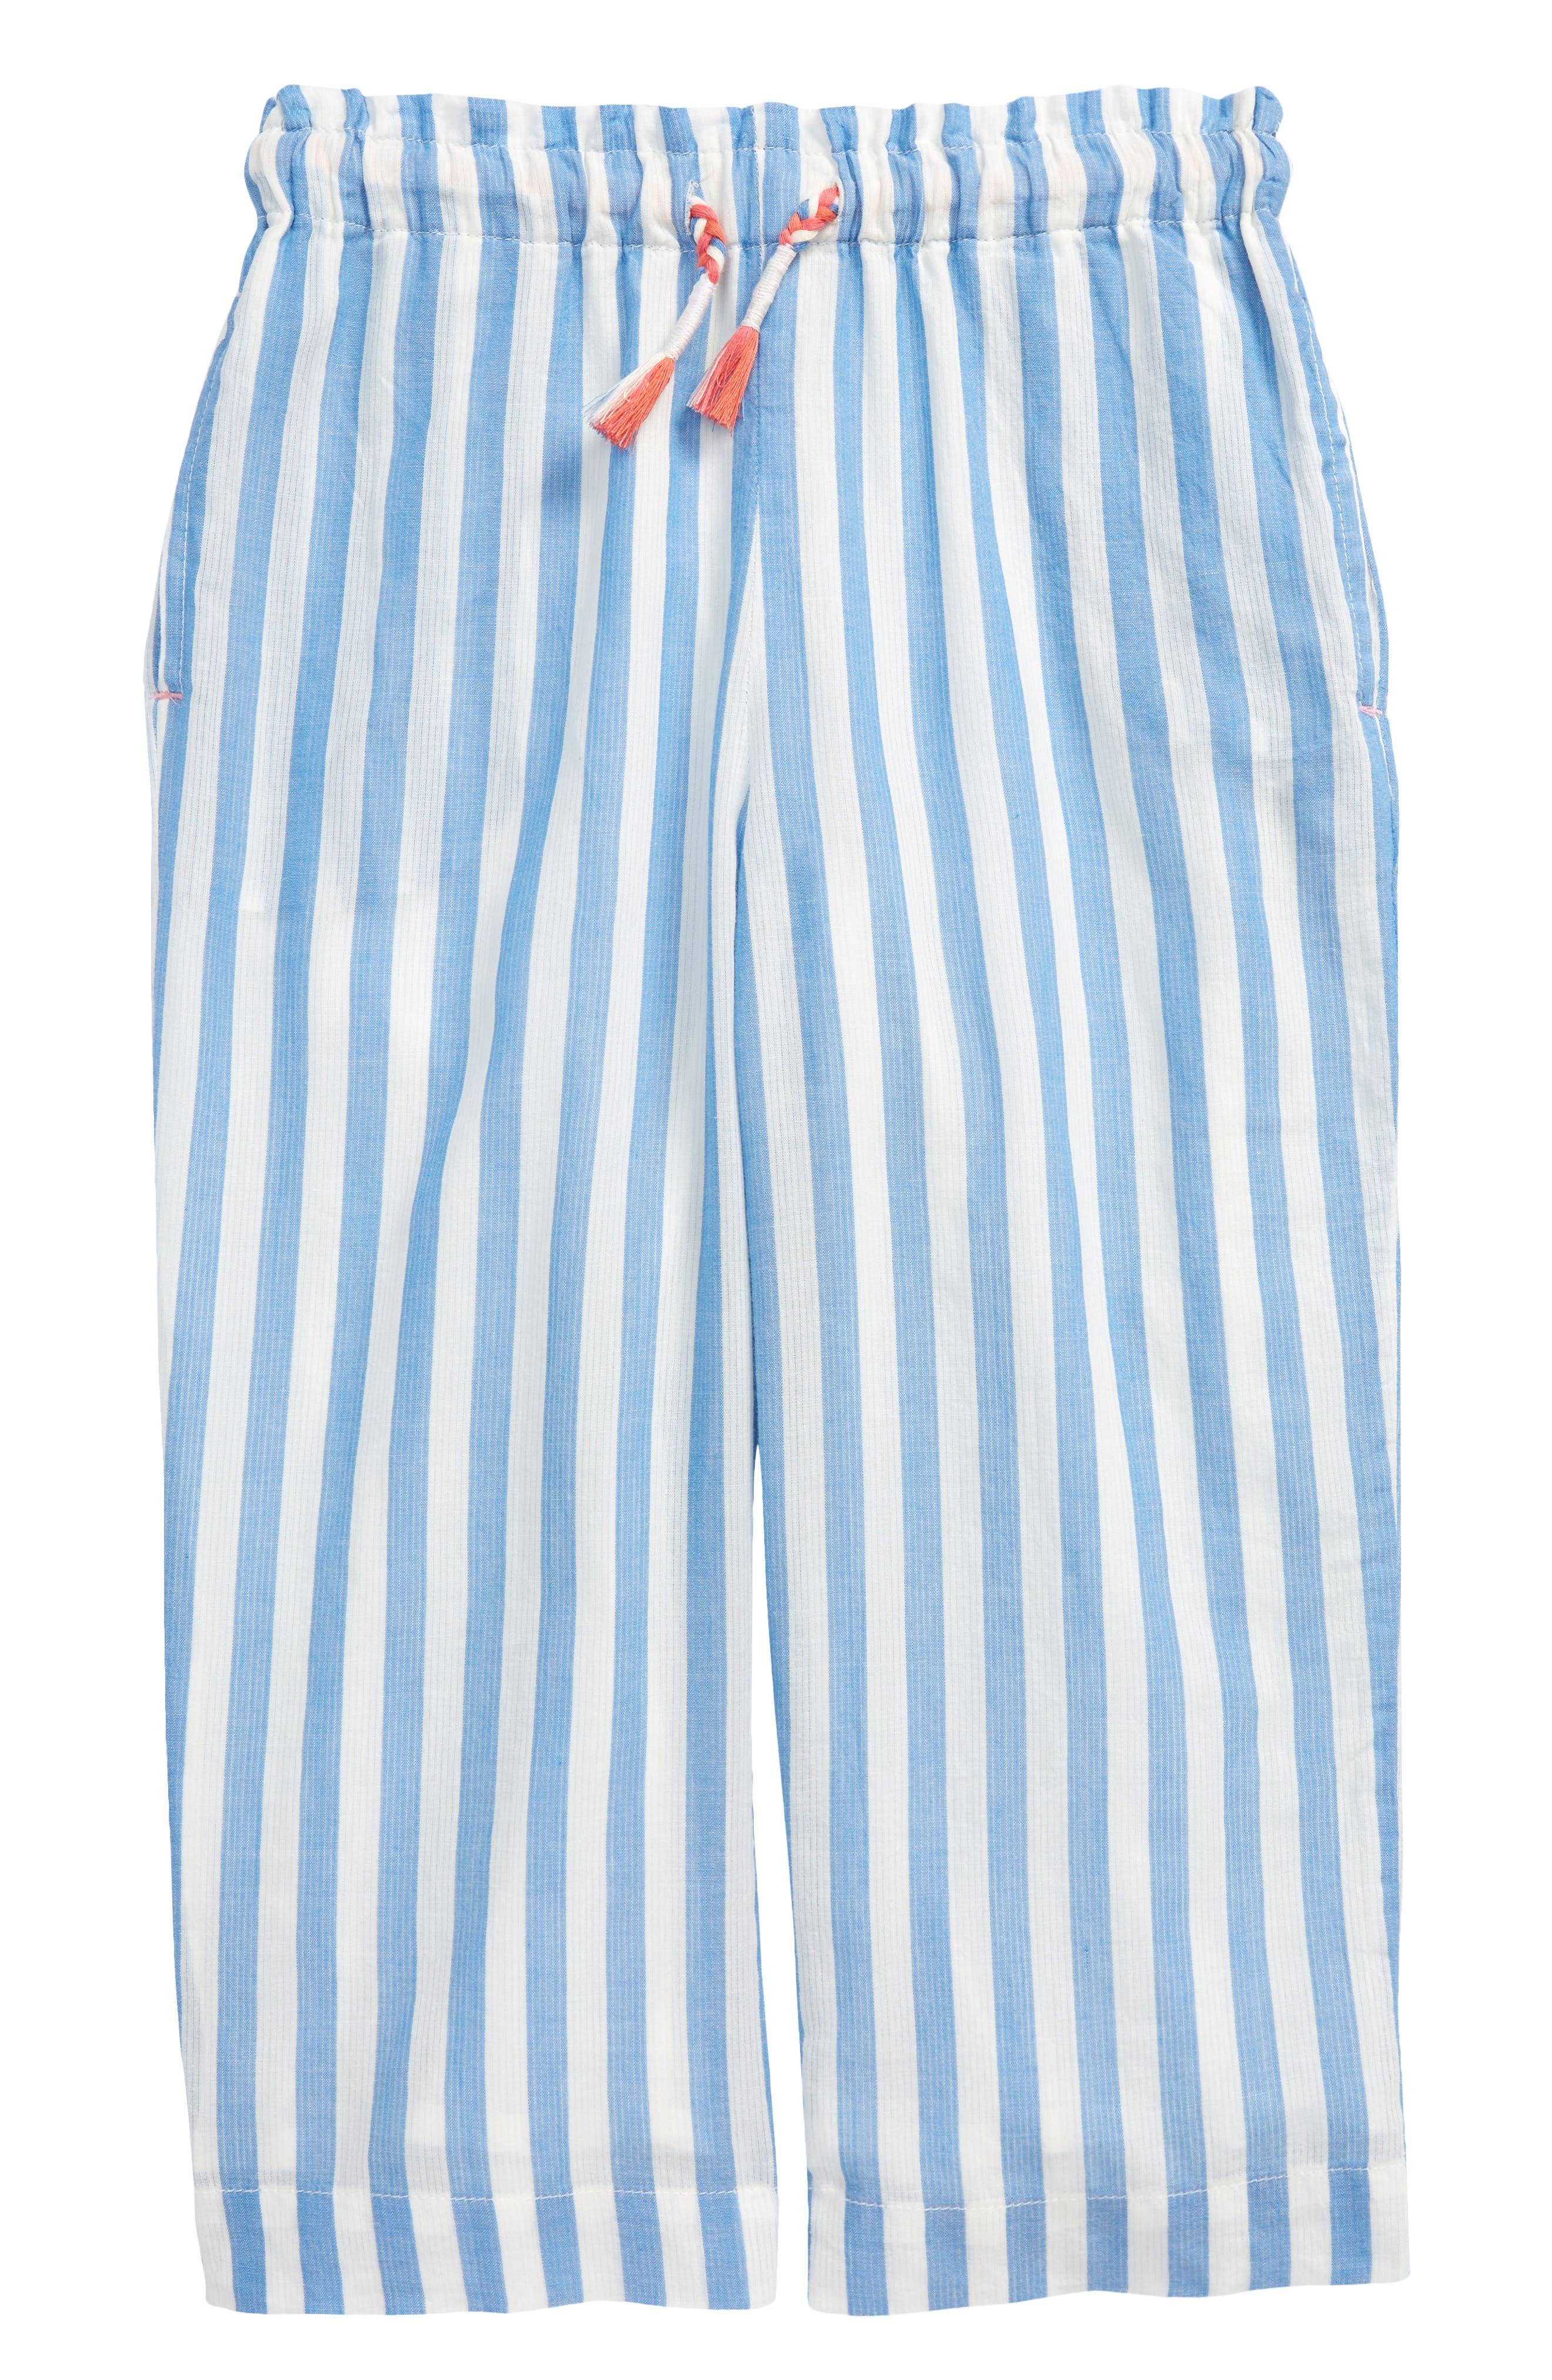 Details about  /Mini Boden Big Girl/'s Leggings Pants Navy 10-12